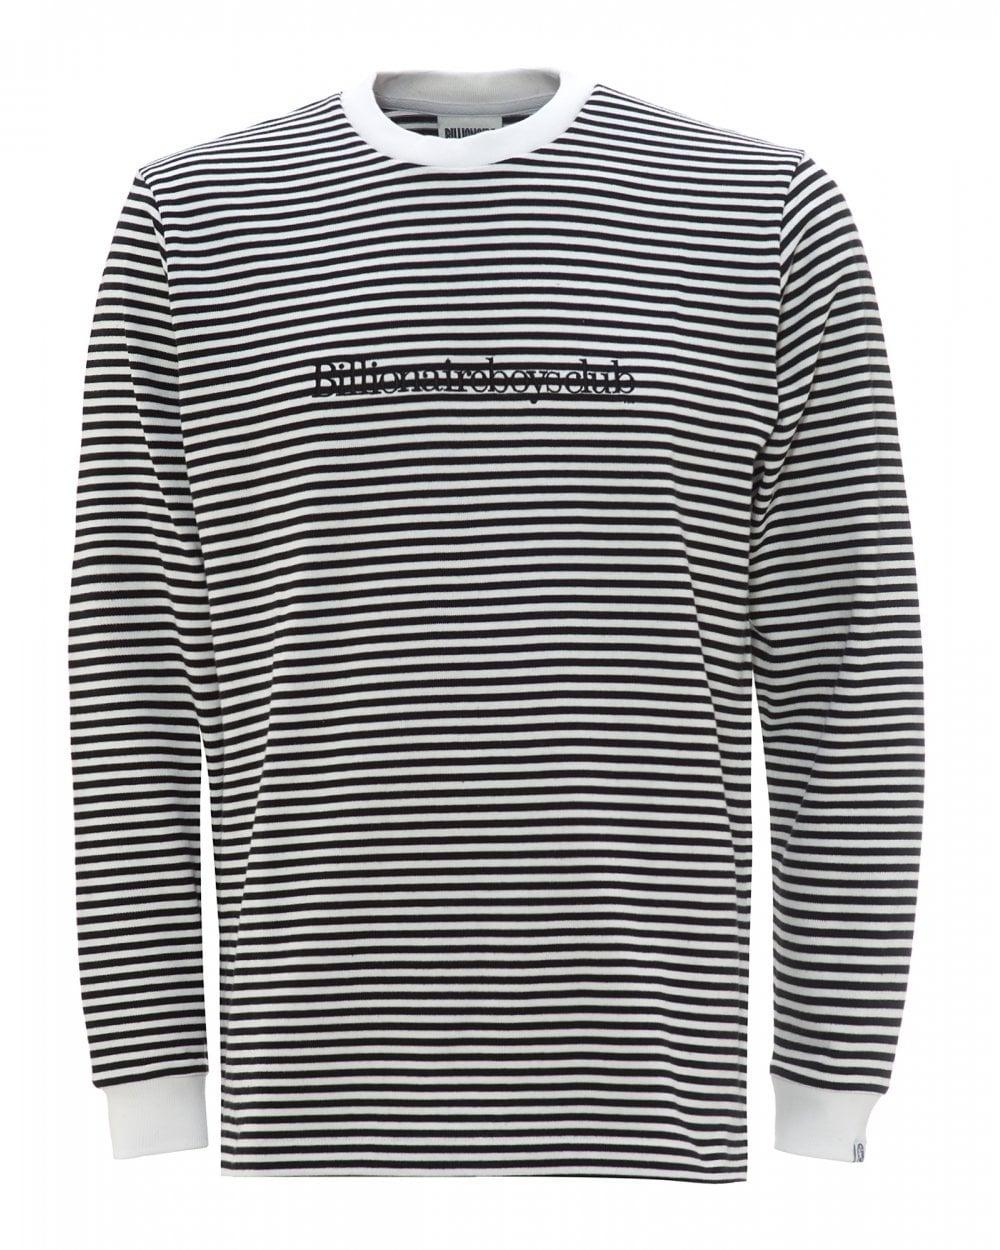 black and white striped shirt boys